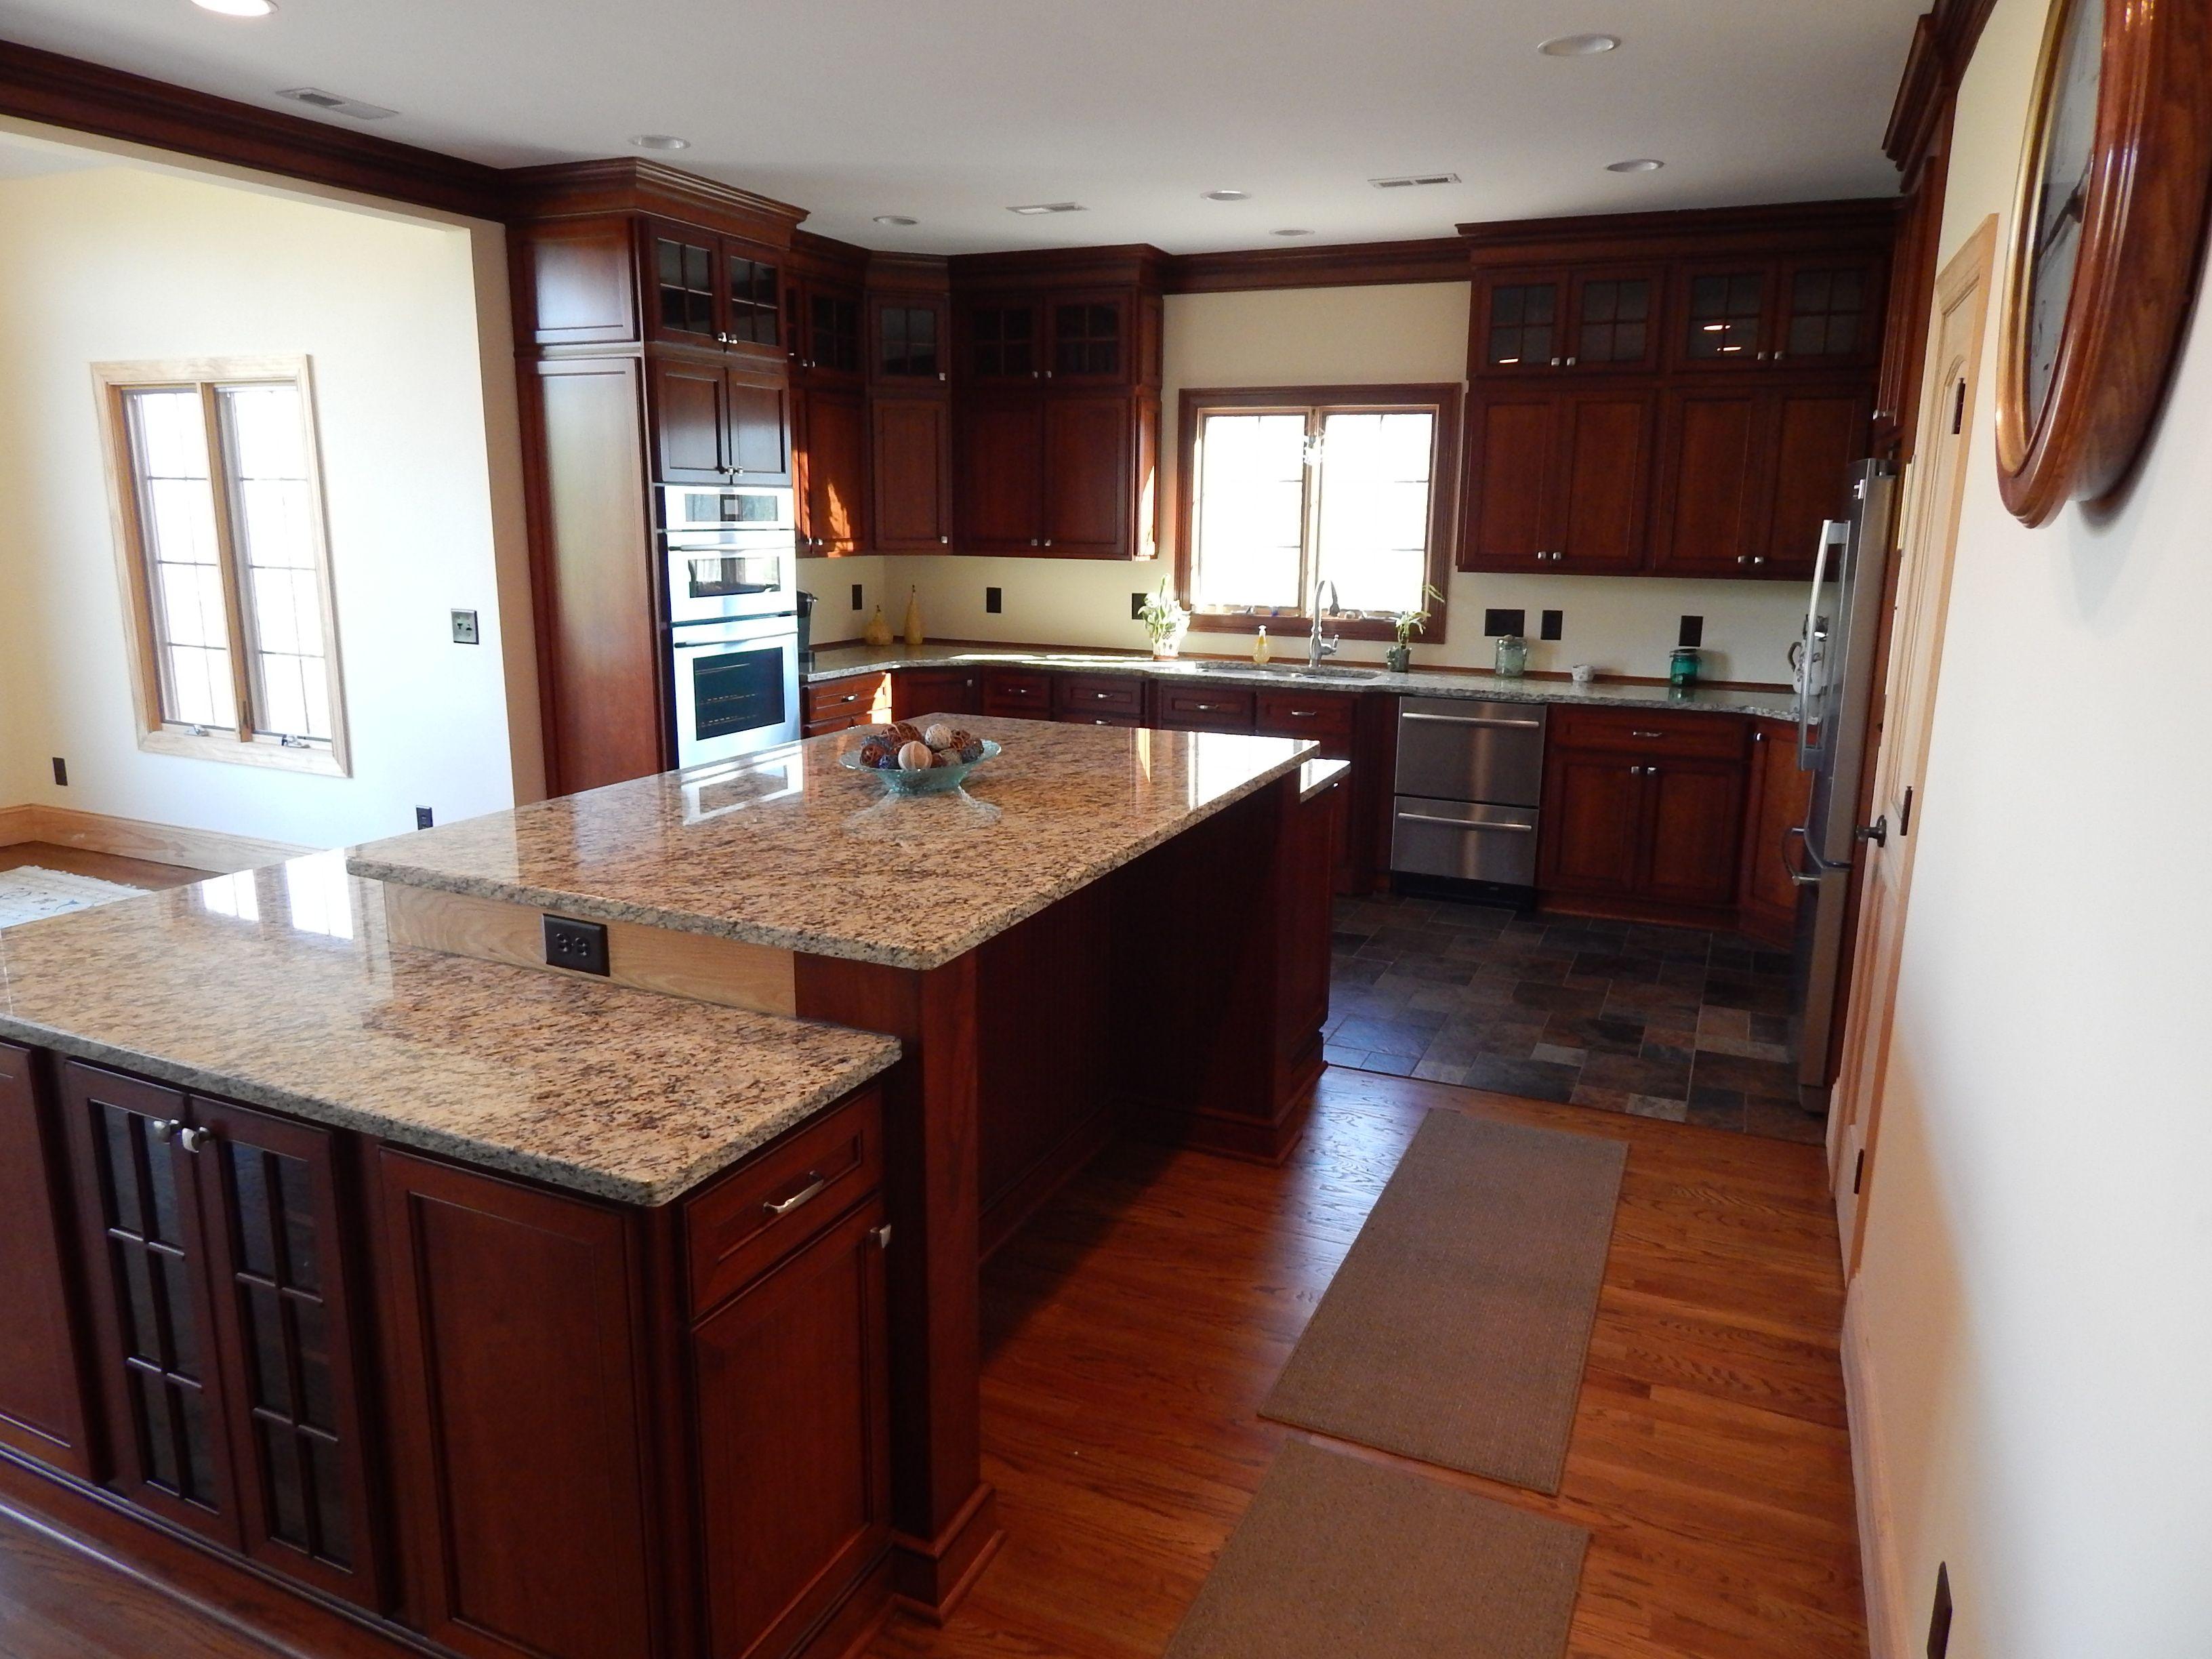 Conestoga Wood Specialty Custom Stain By Justincabinets Www Justincabinets Com Kitchen Cabinets Kitchen Cabinets Kitchen Cabinet